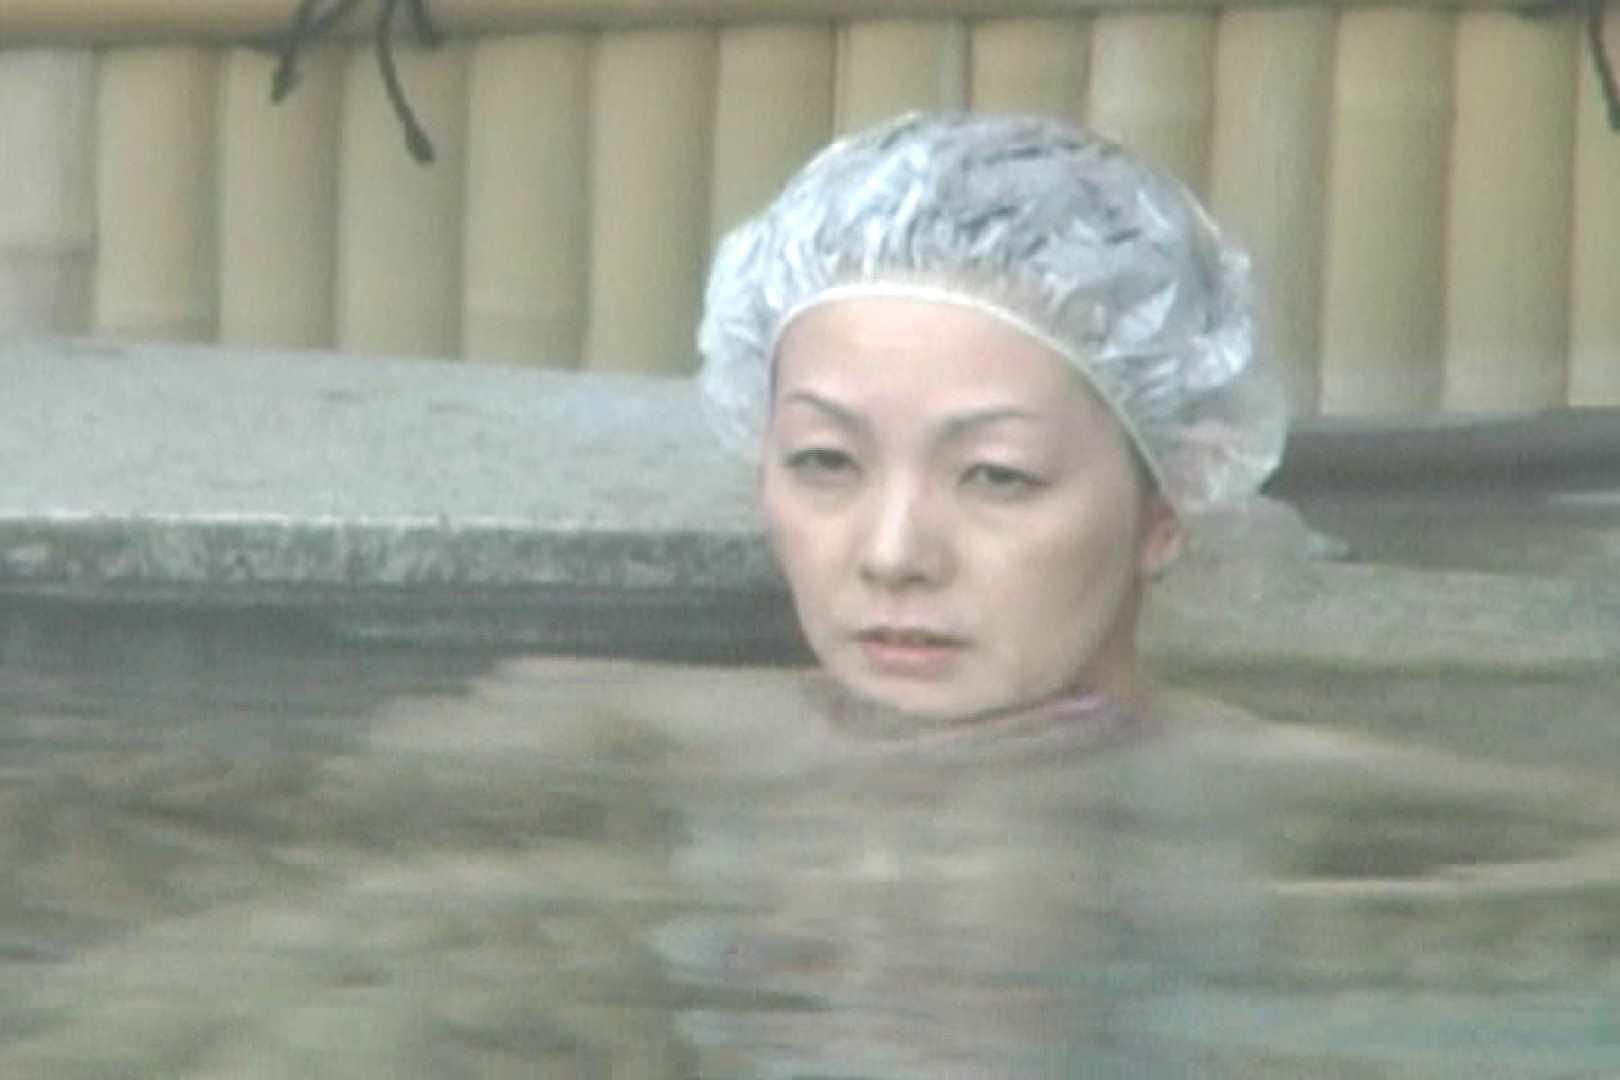 Aquaな露天風呂Vol.592 盗撮師作品  91pic 57